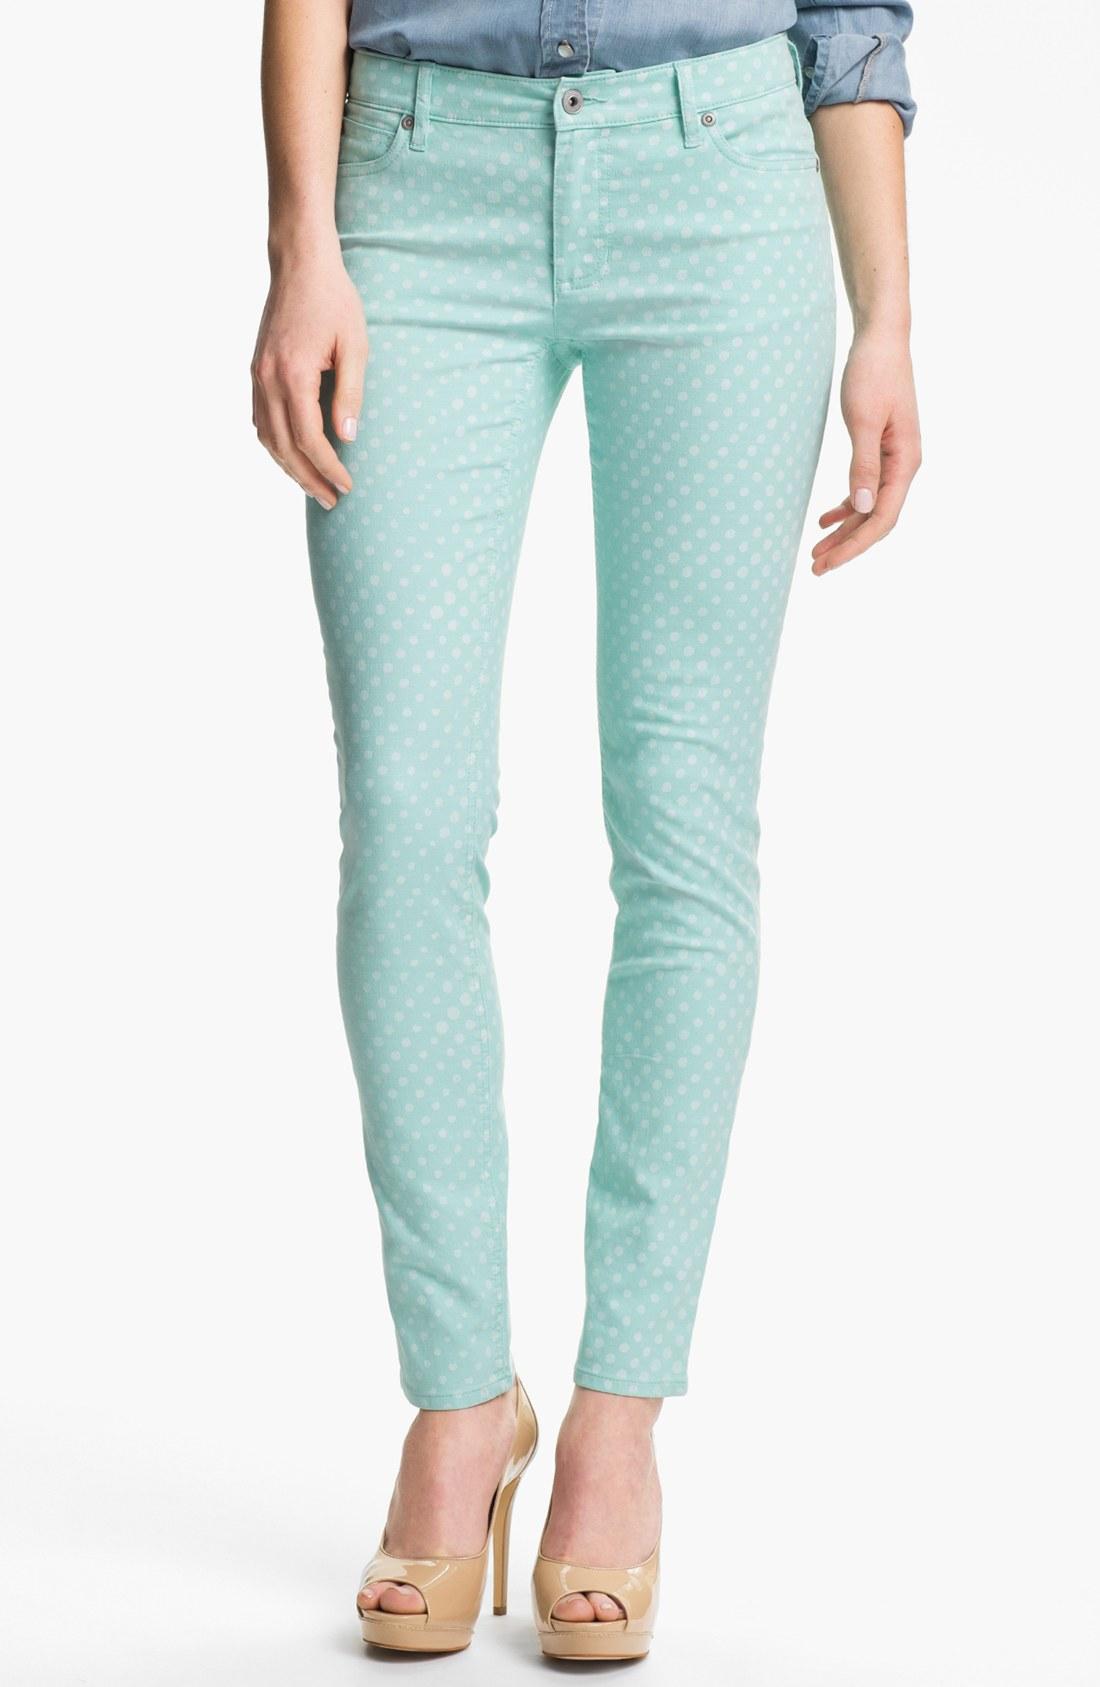 Find great deals on eBay for polka dot denim jeans. Shop with confidence.